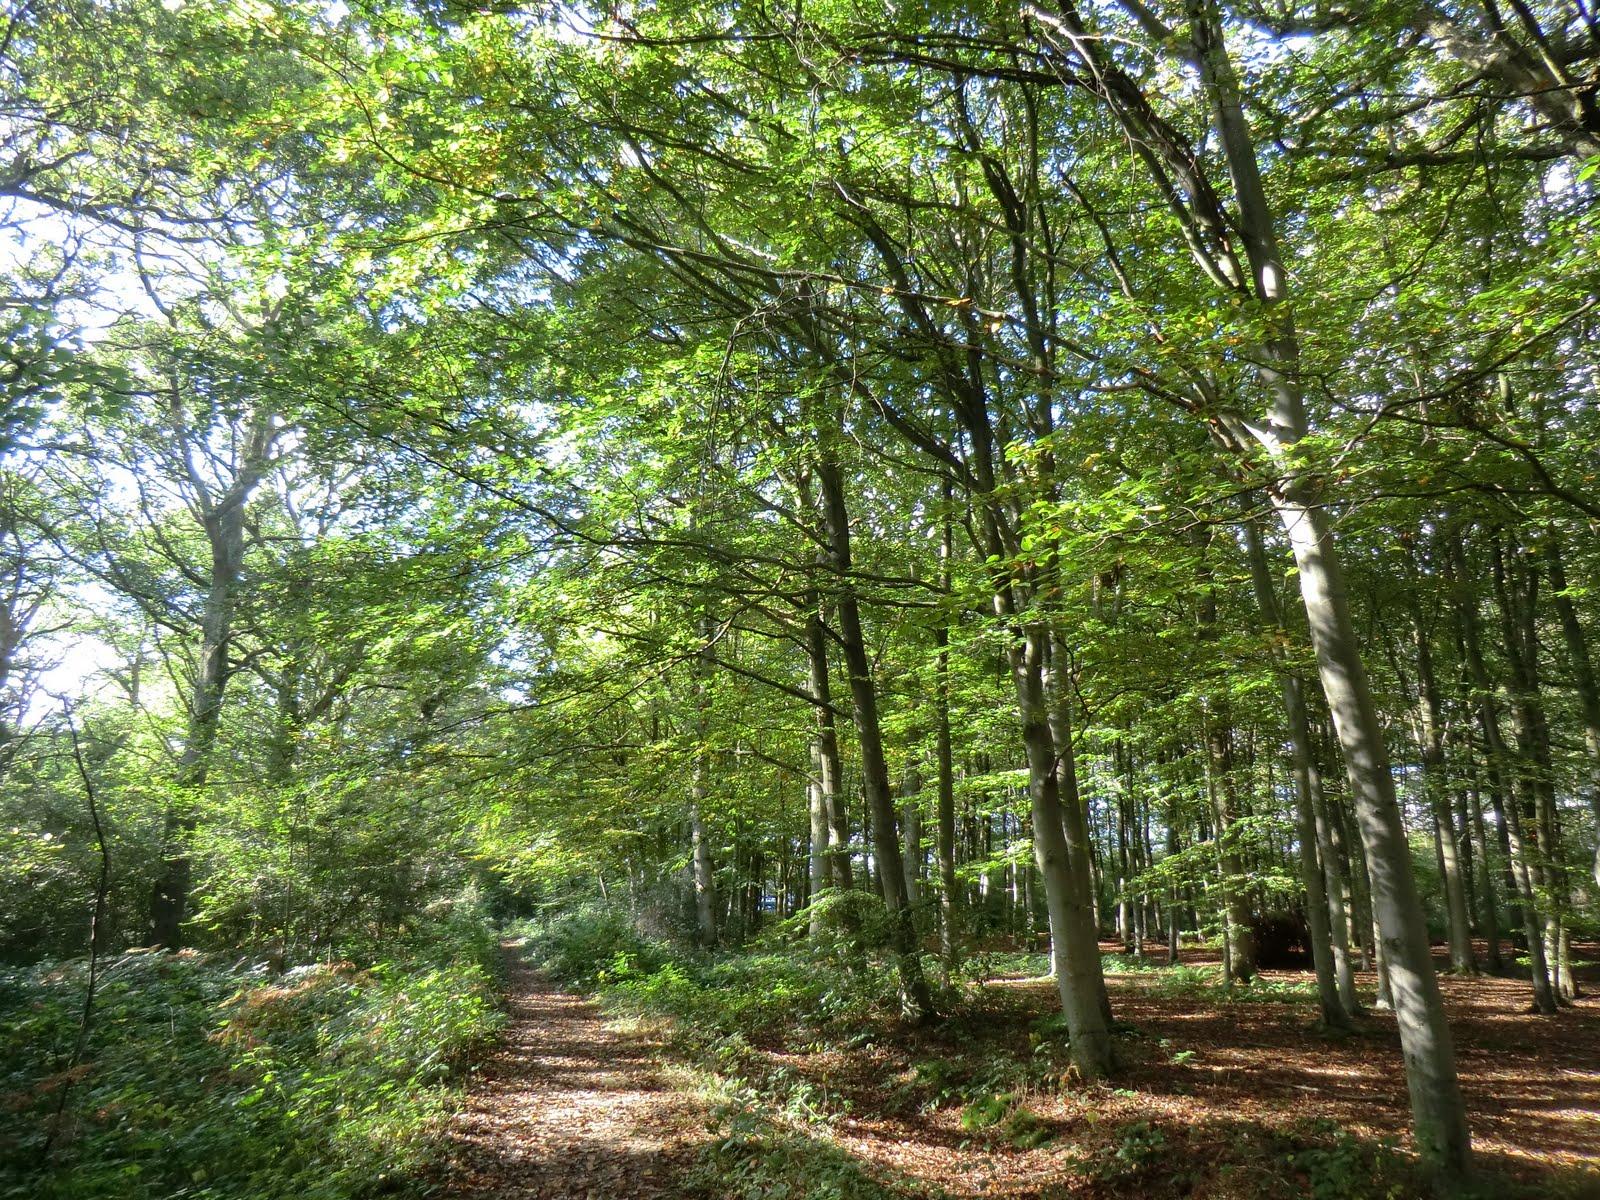 CIMG4425 Standgrove Wood